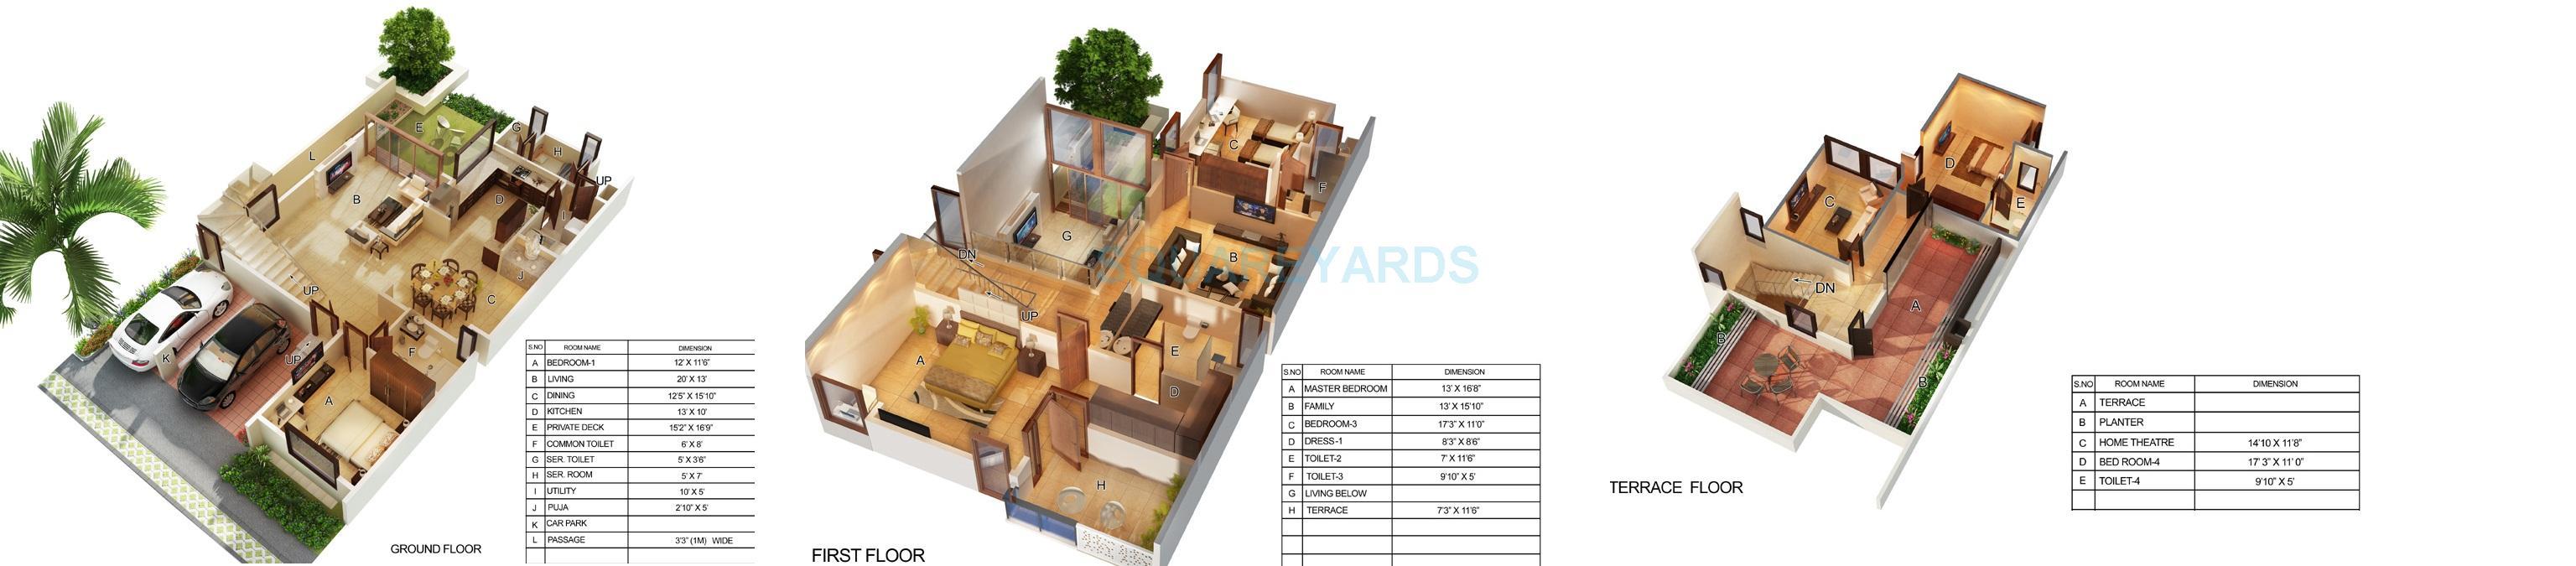 mantri courtyard villa 4bhk 2795sqft1